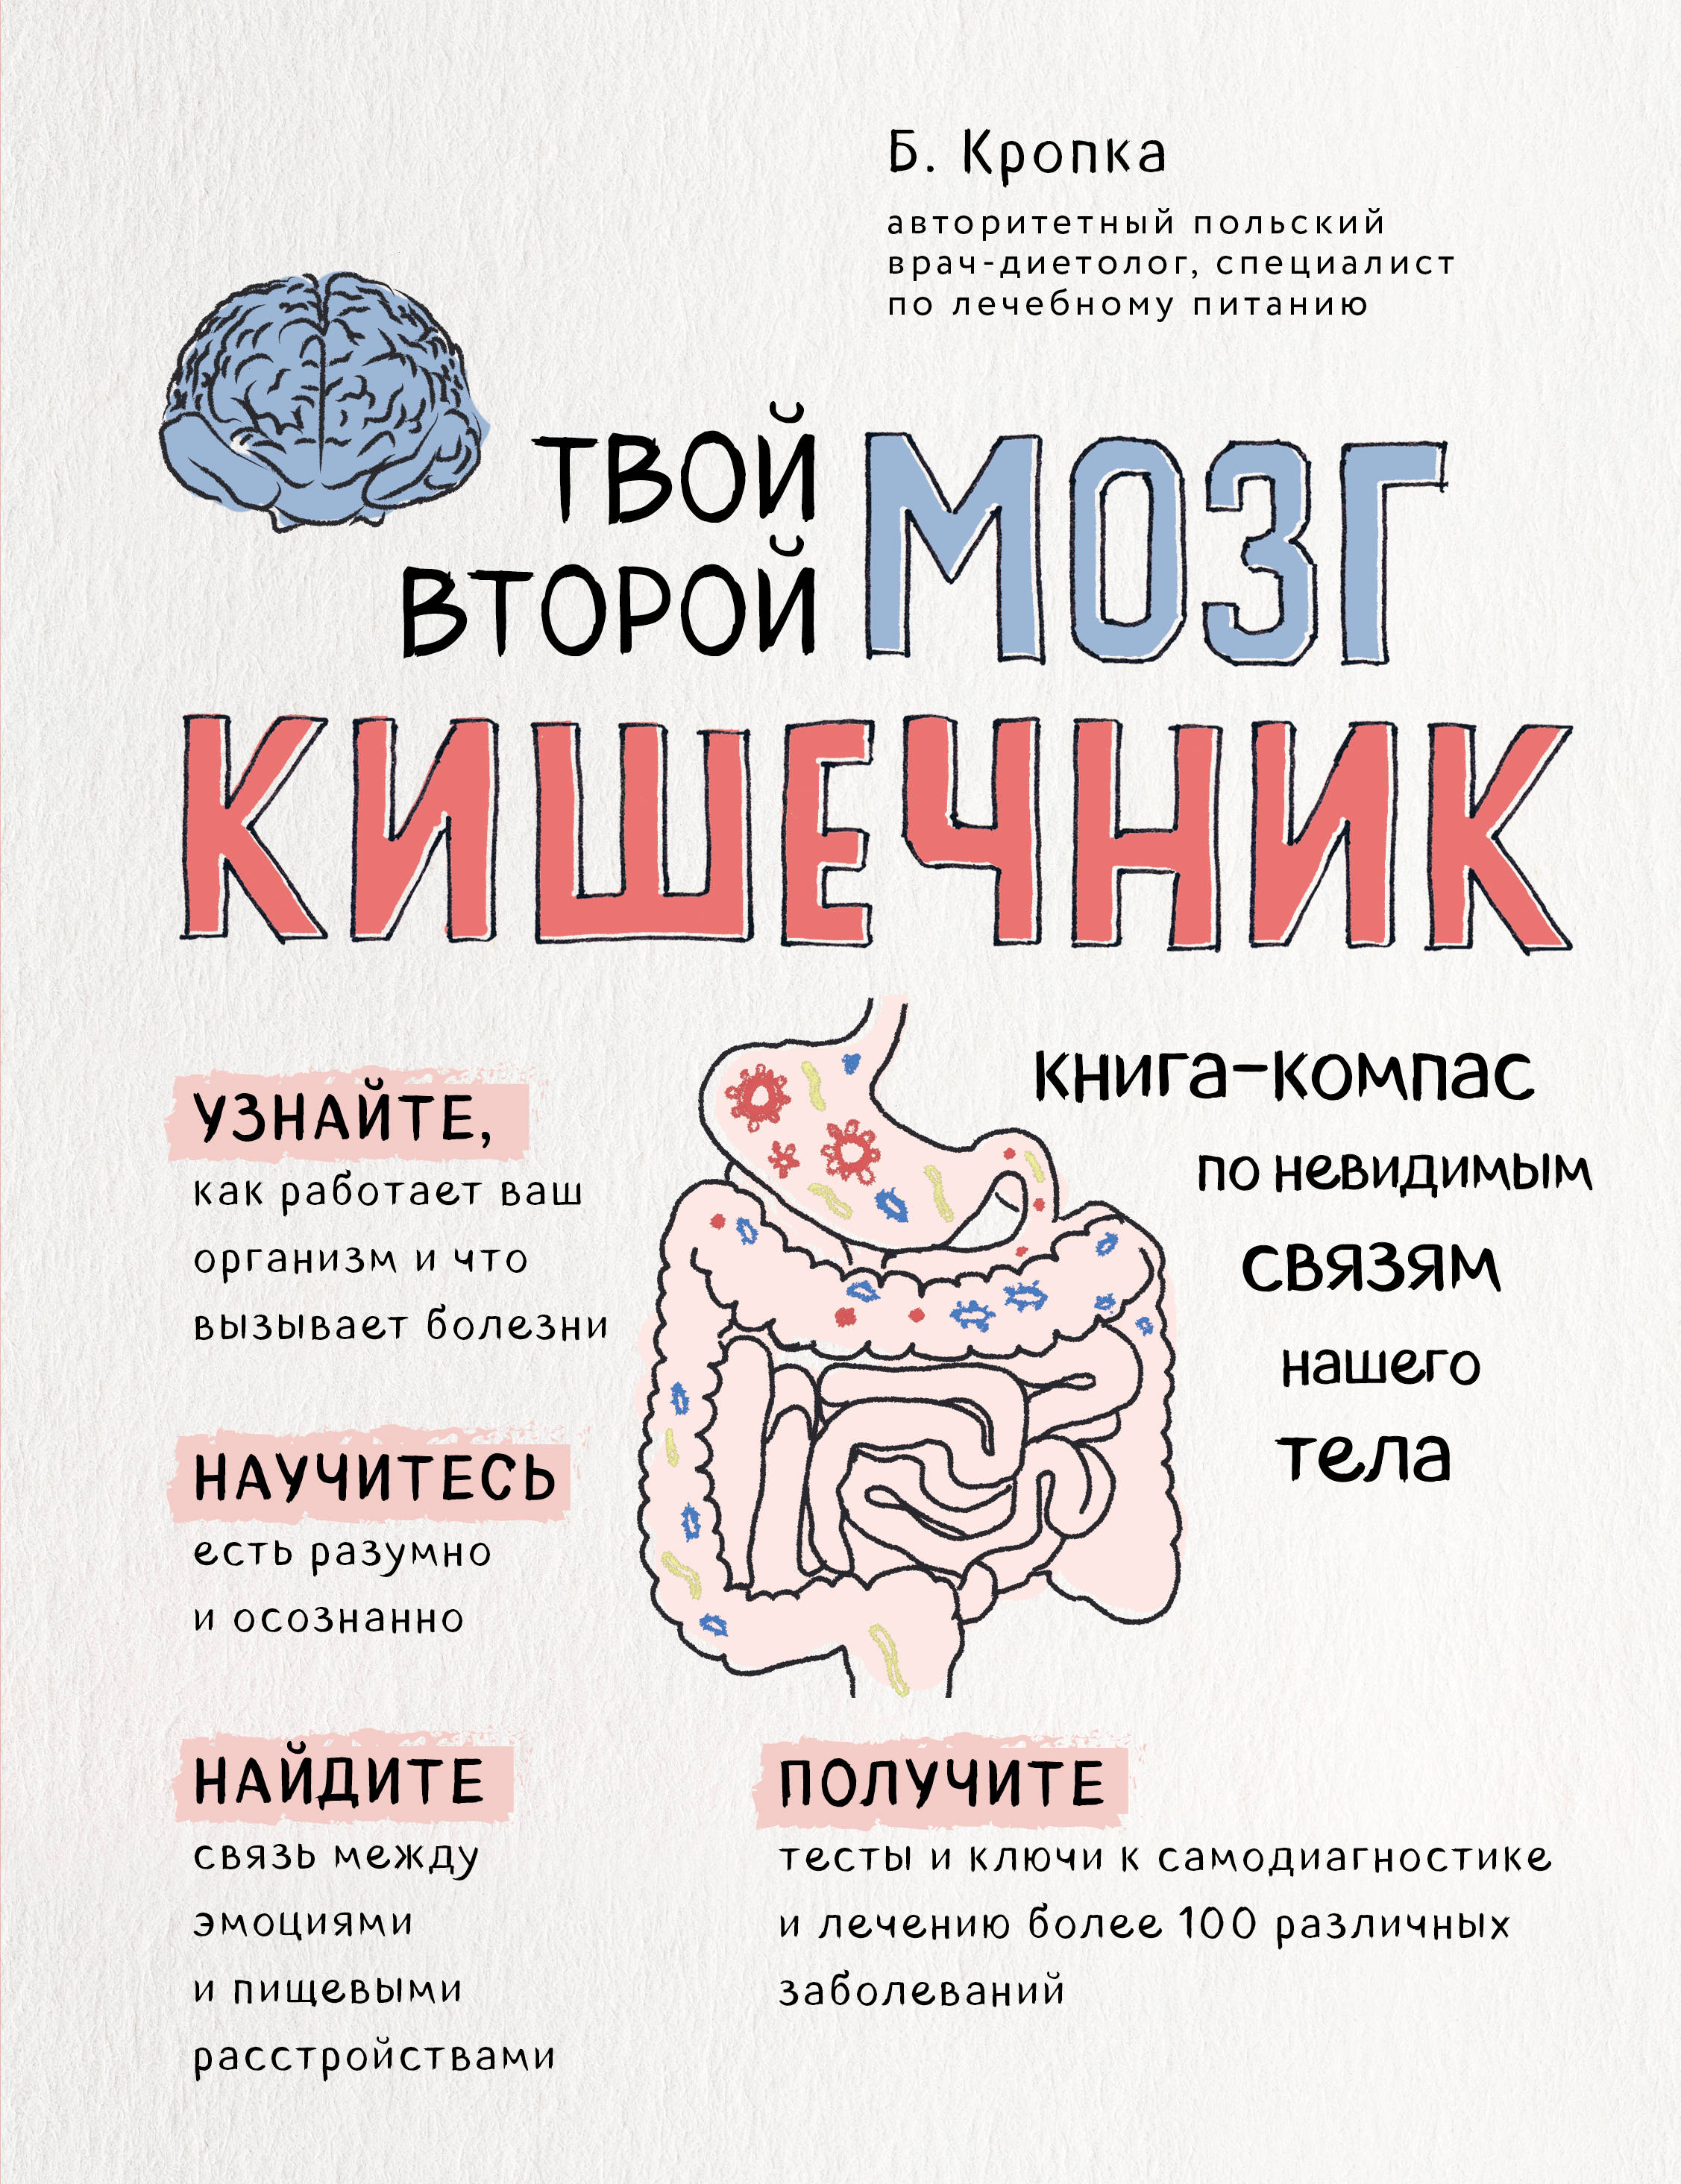 Tvoj vtoroj mozg - kishechnik. Kniga-kompas po nevidimym svjazjam nashego tela